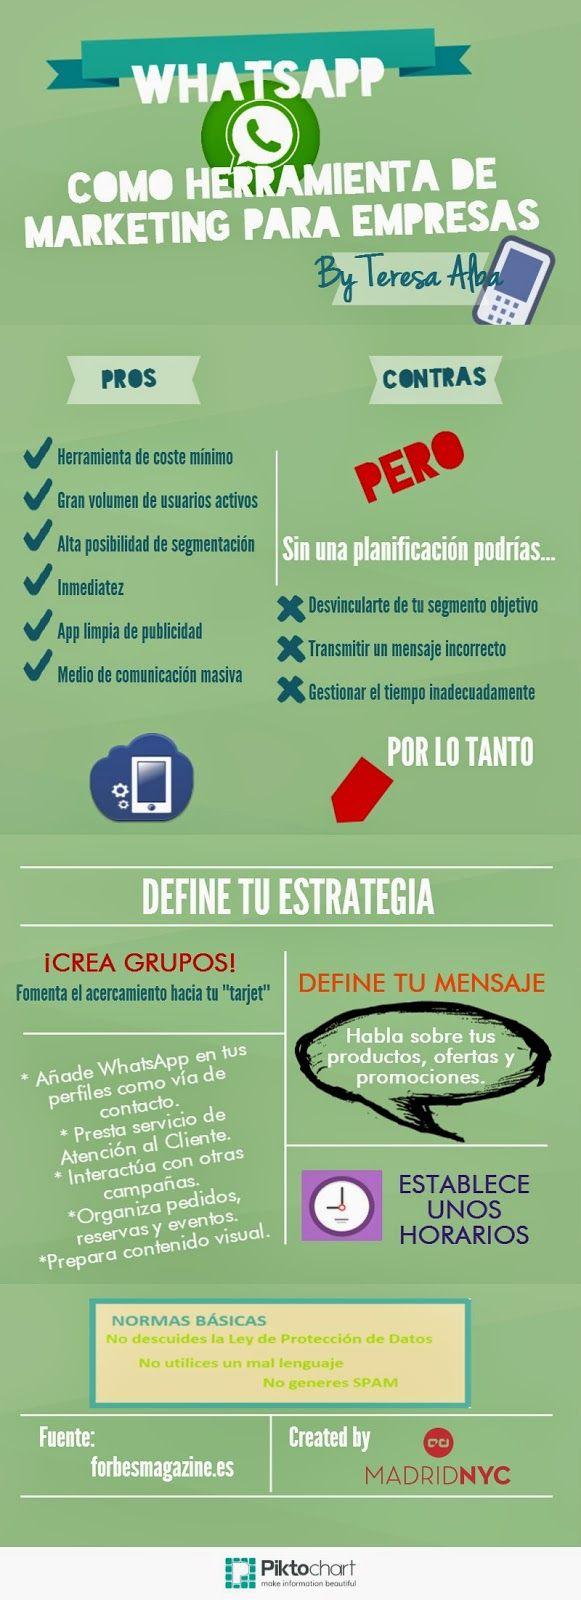 WhatsApp como herramienta de Marketing para empresas-Infografía